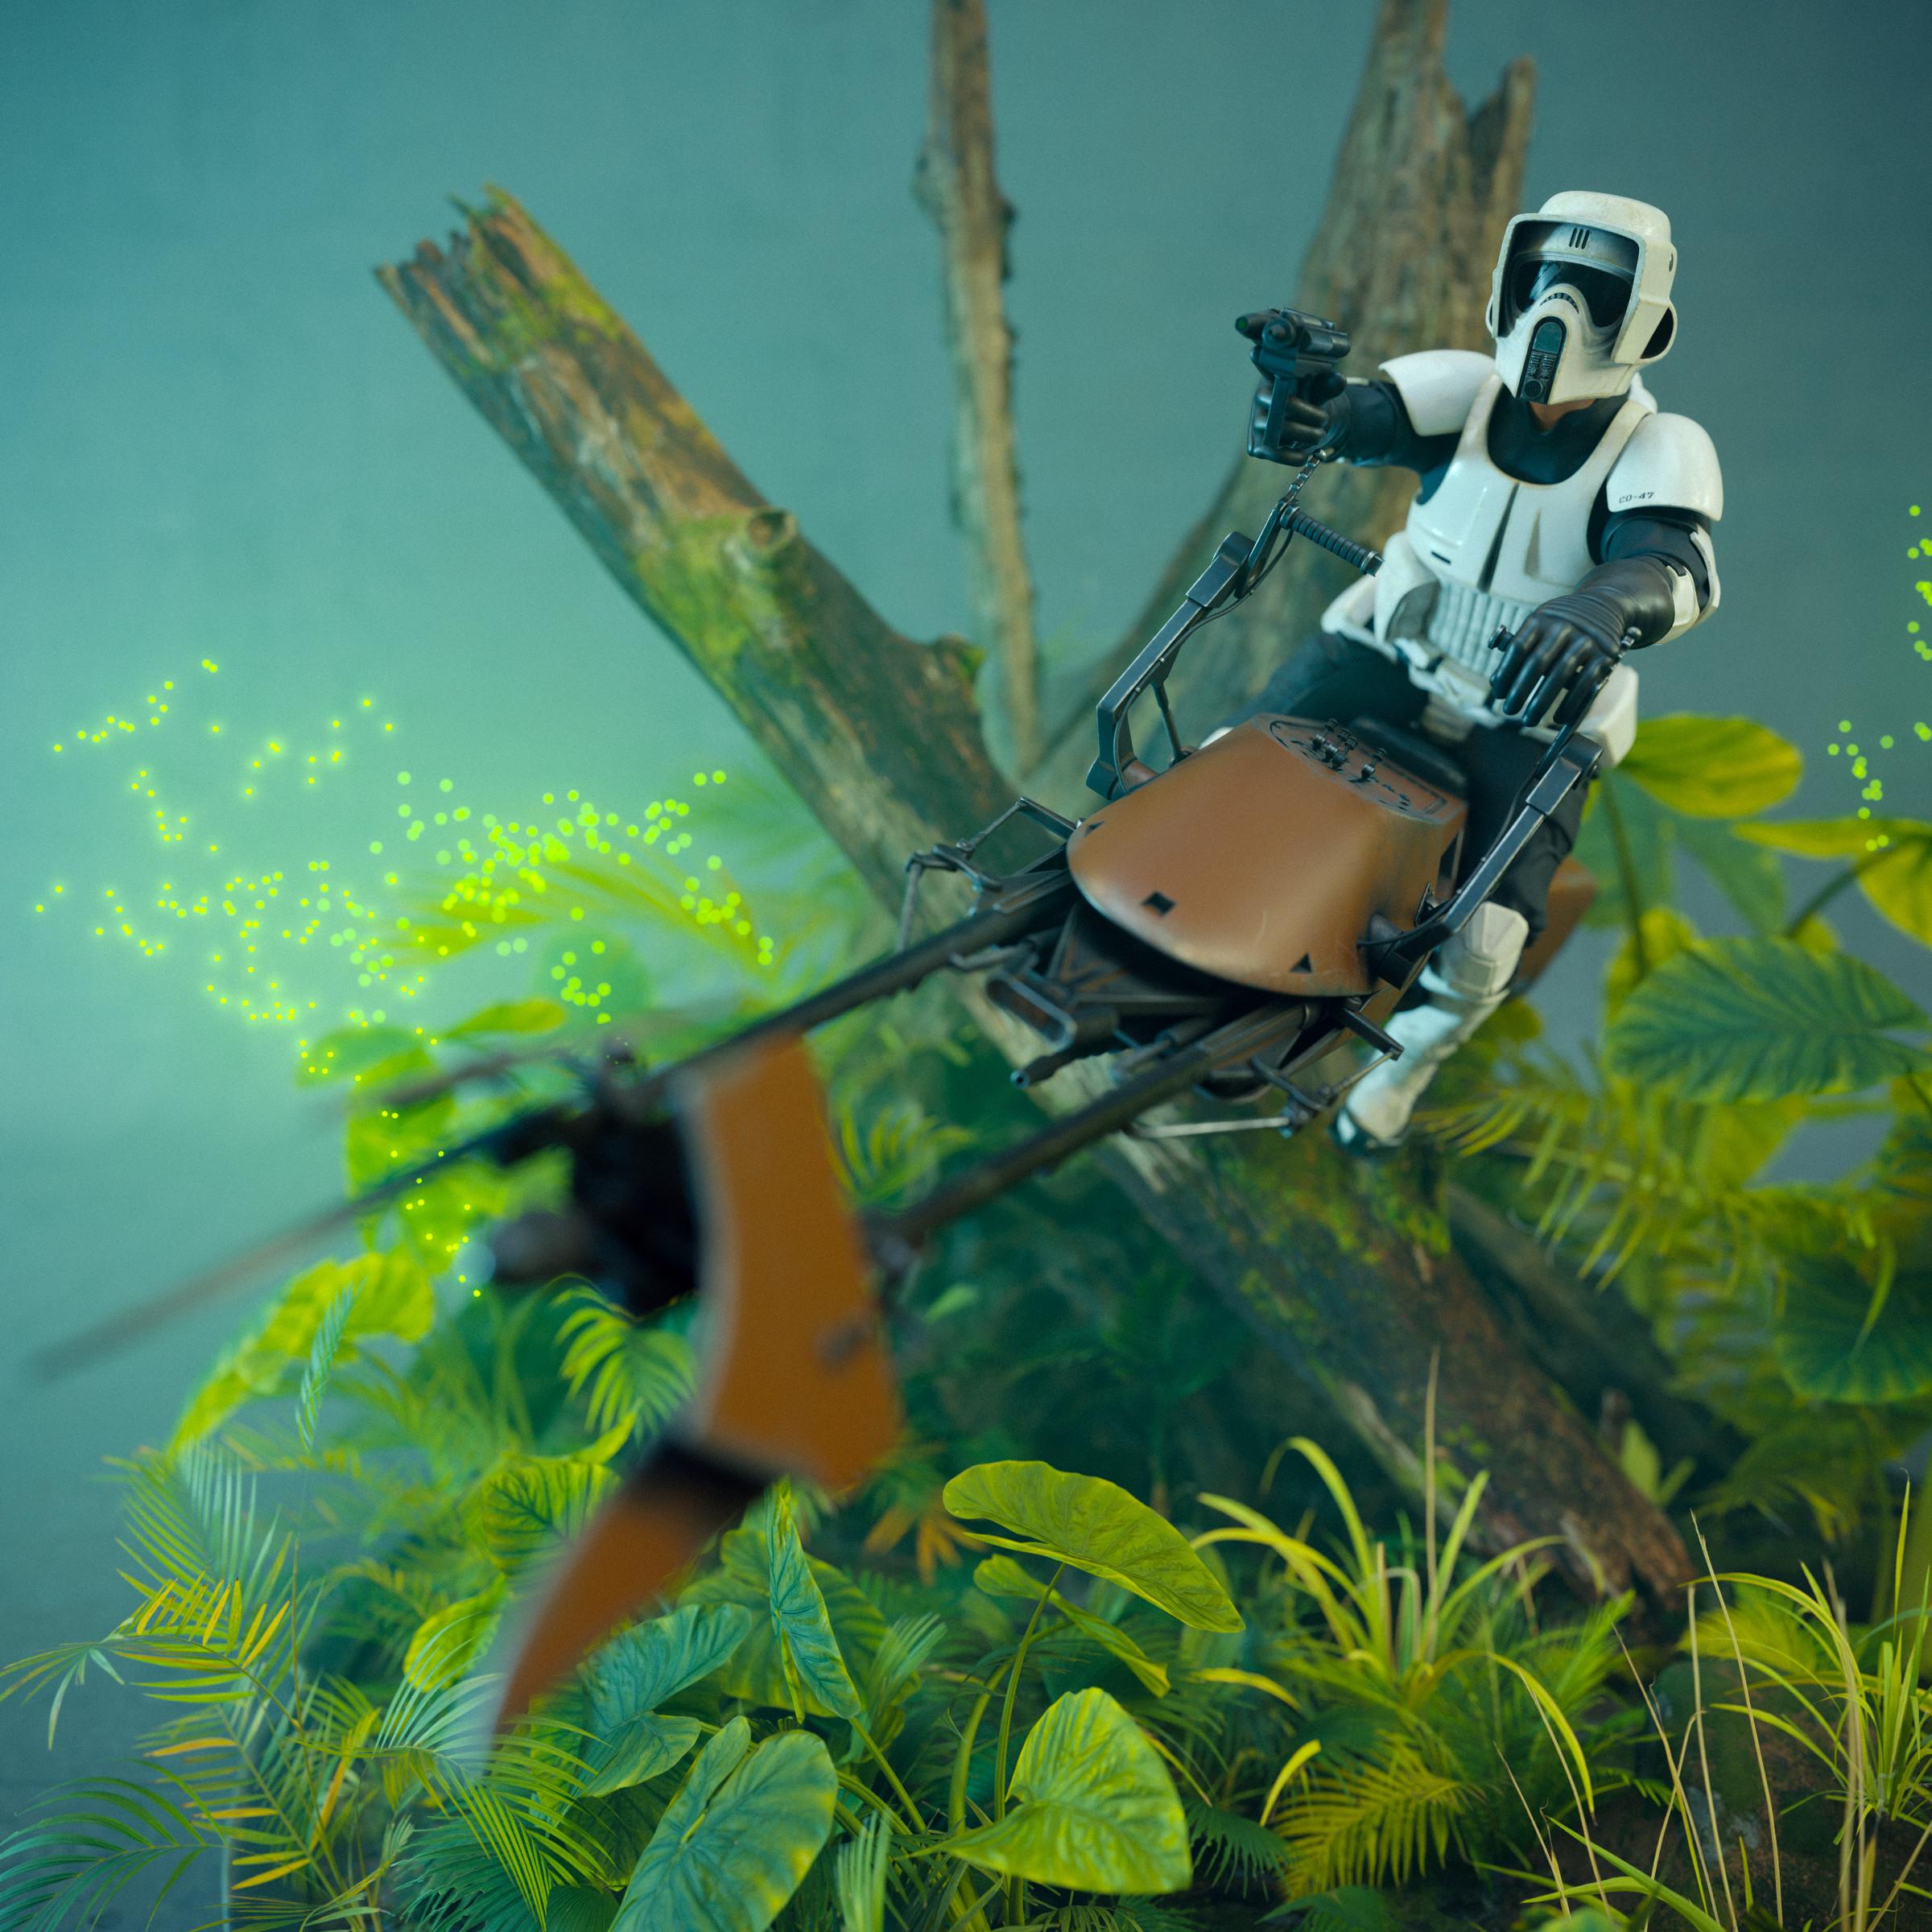 General 2400x2400 speeder bike scout trooper Star Wars Imperial Forces toys ArtStation action figures